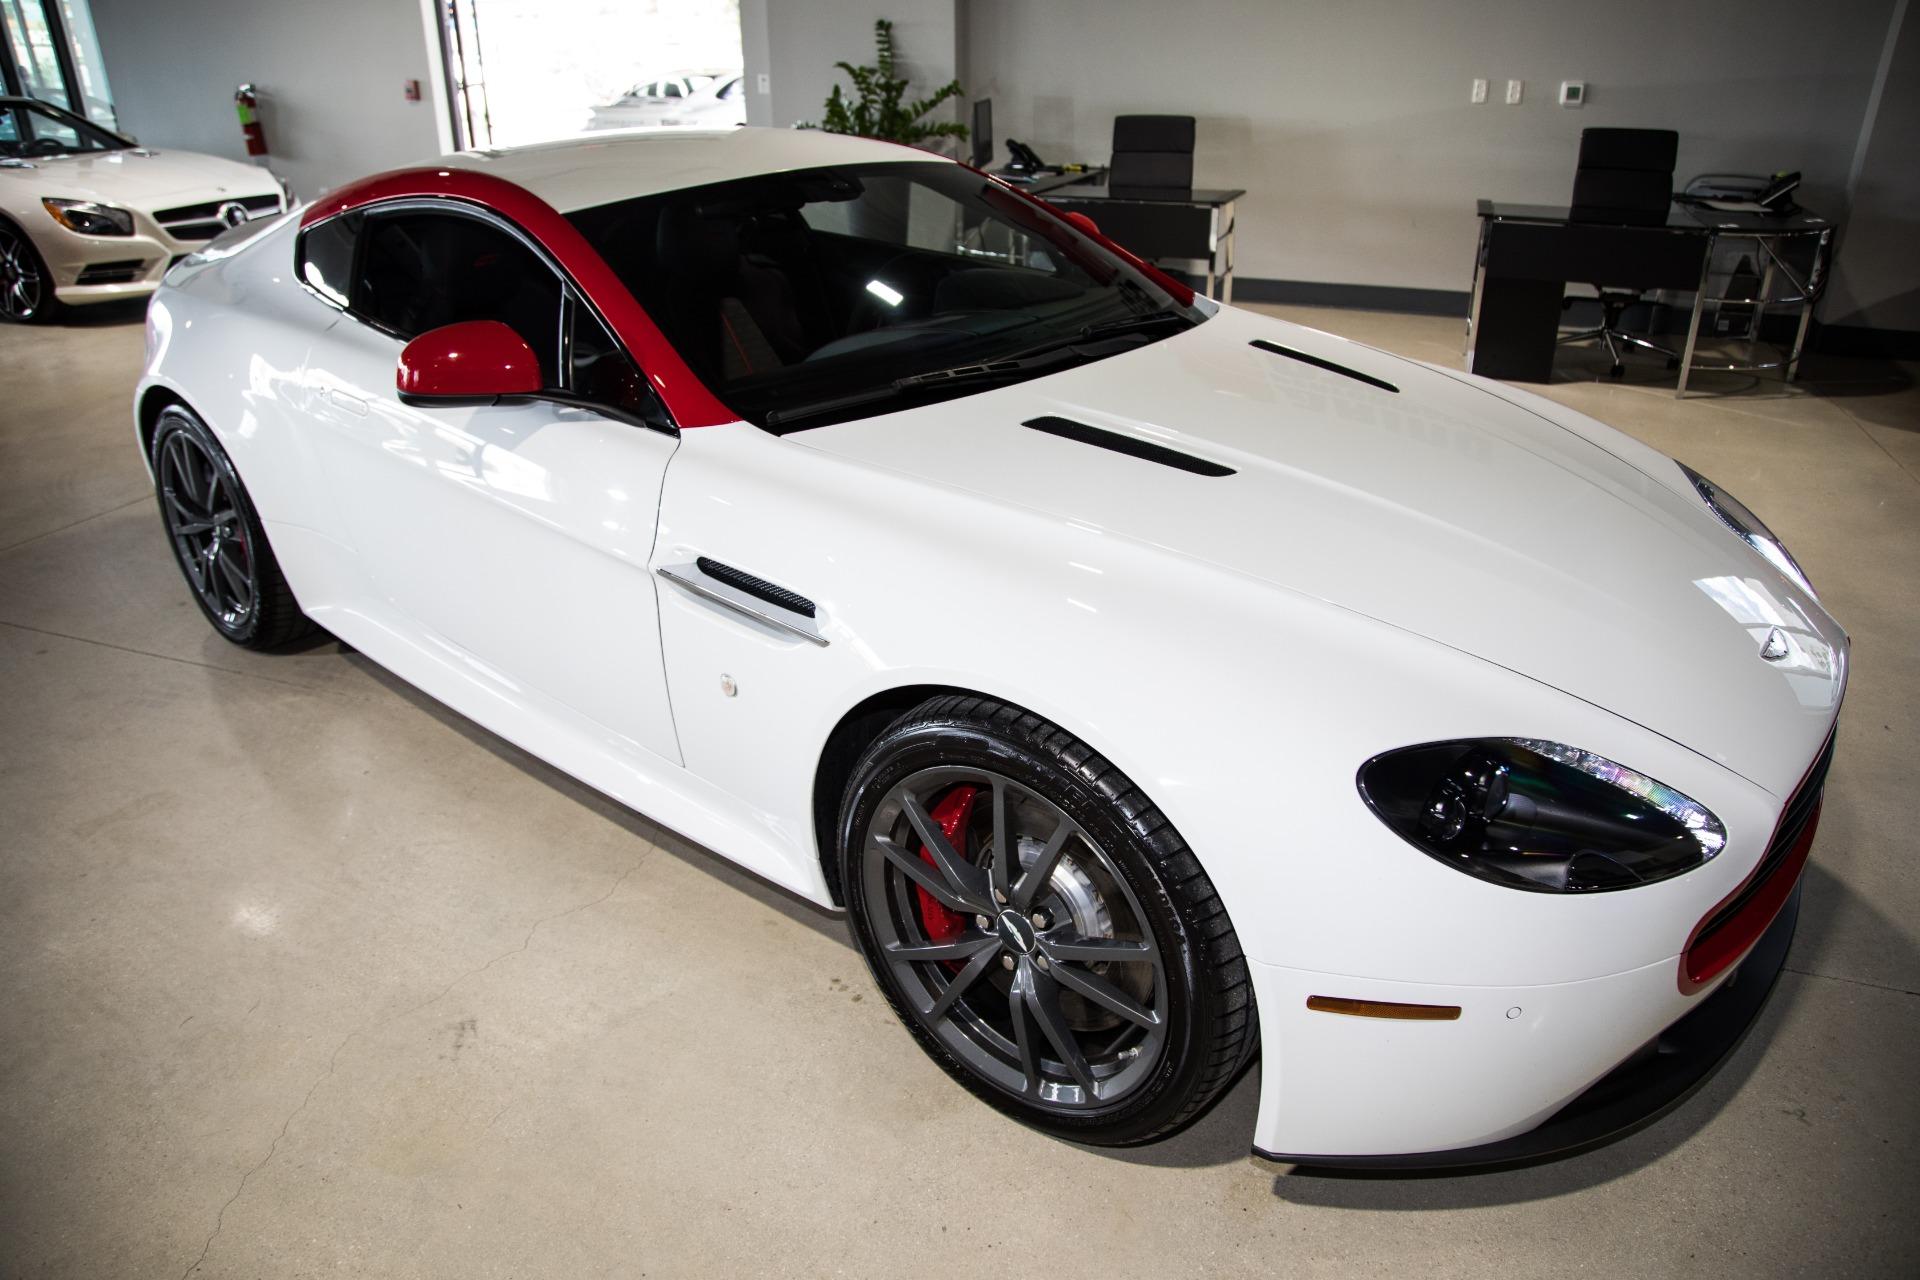 Used 2015 Aston Martin V8 Vantage Gt For Sale 74 900 Marino Performance Motors Stock C19044